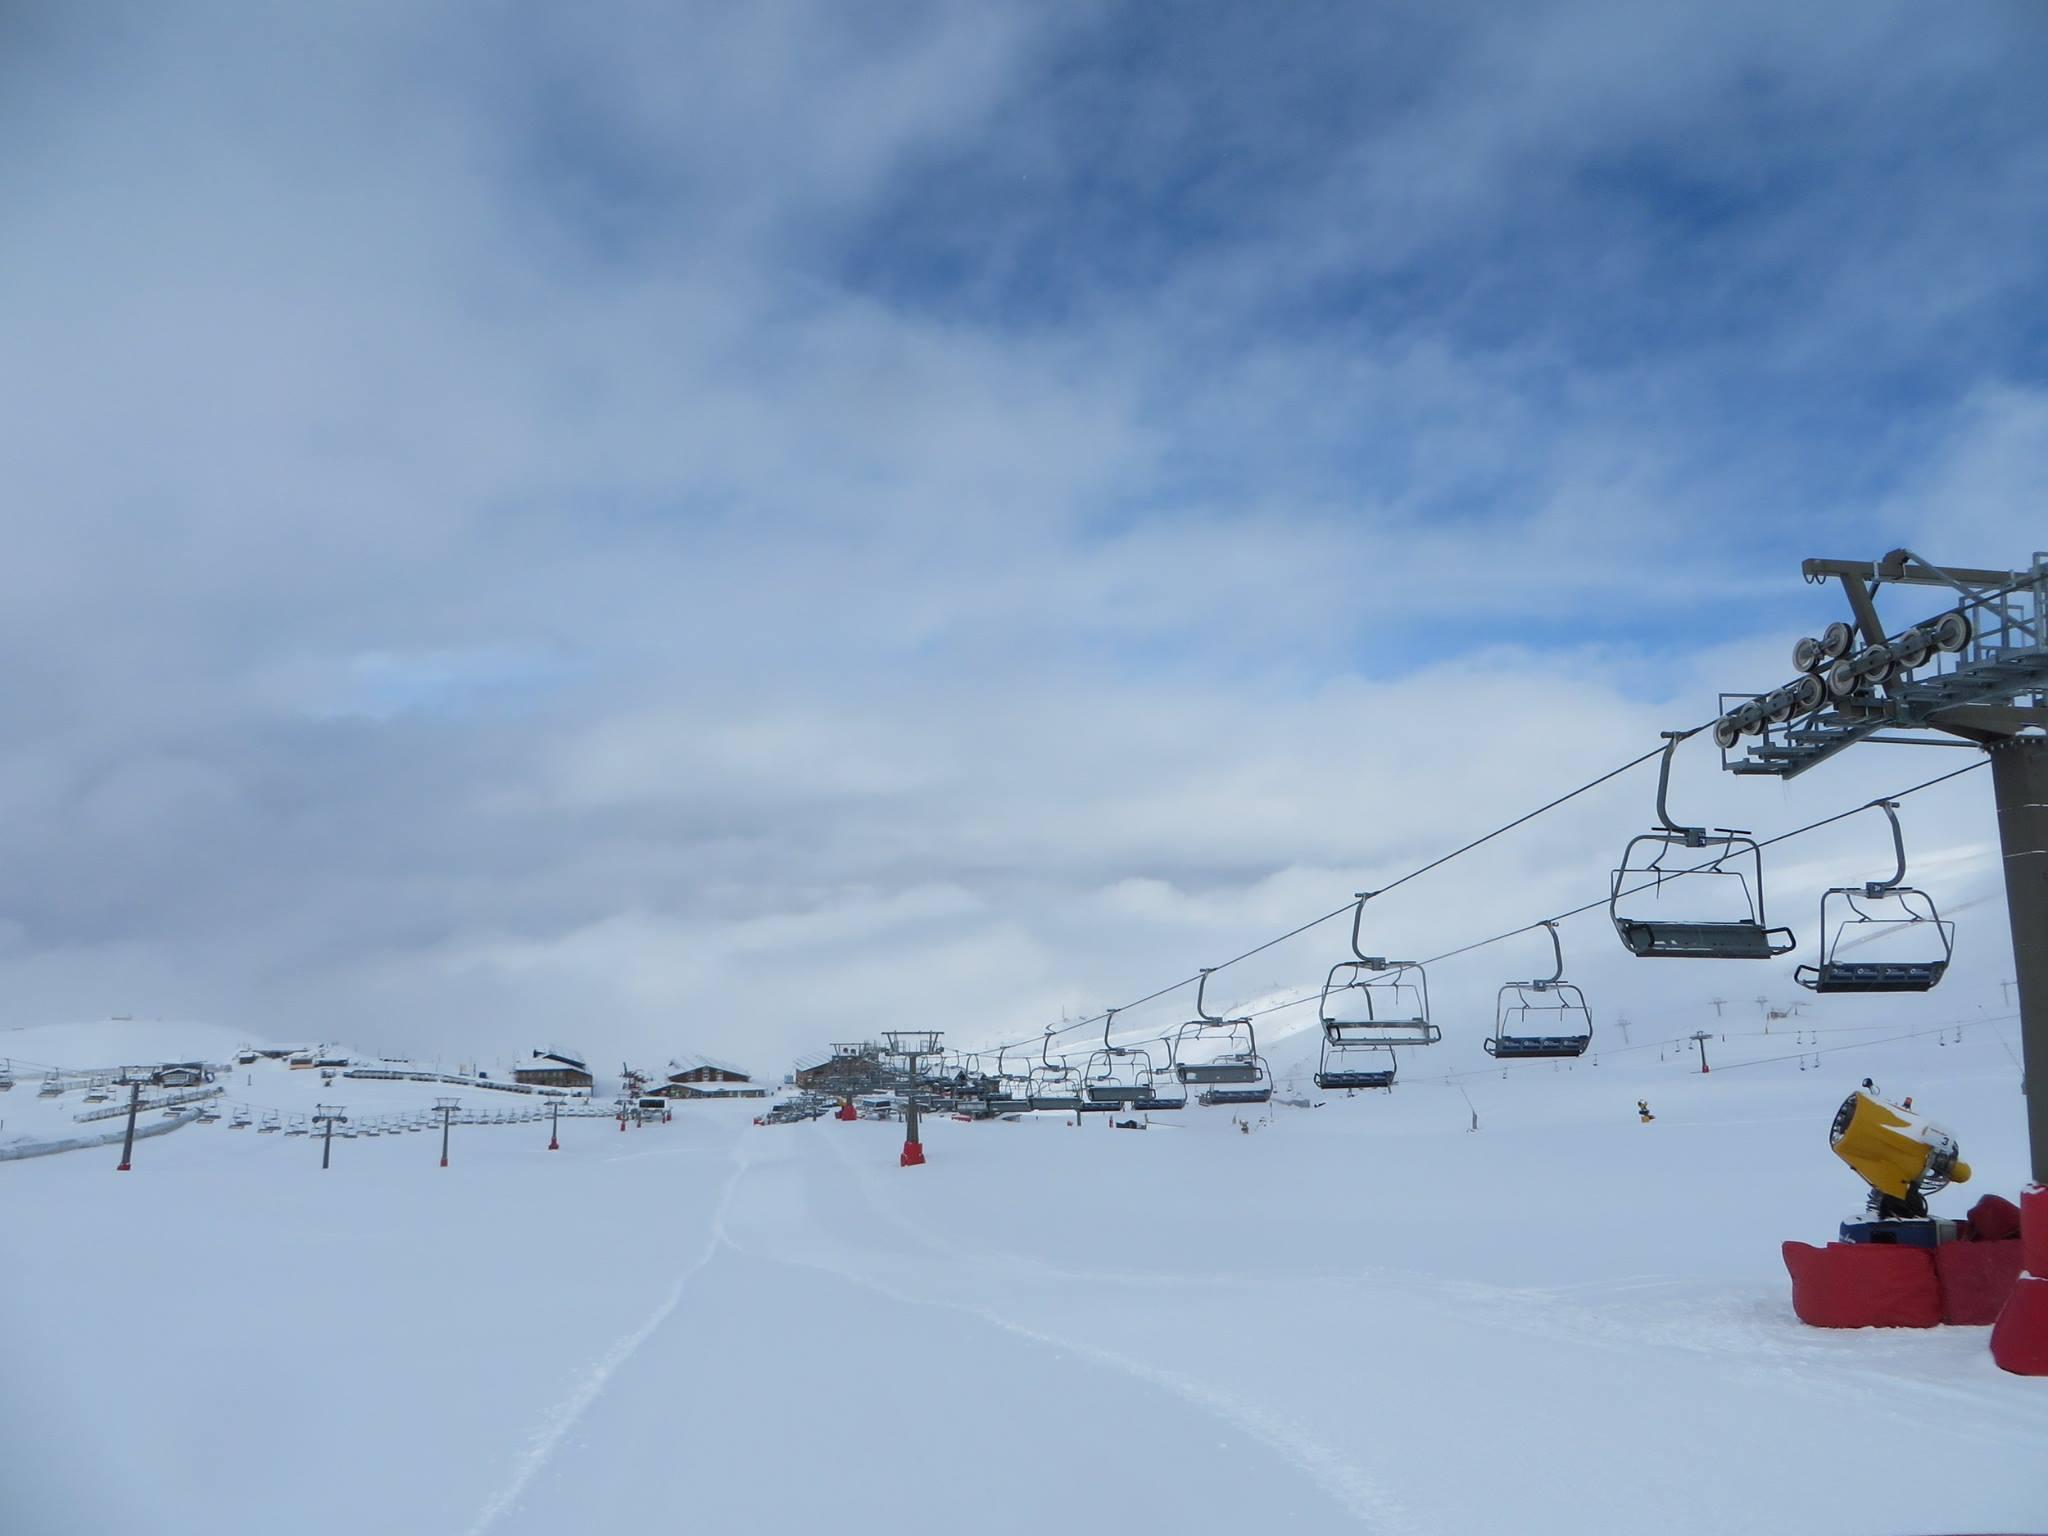 Sierra Nevada recibe hasta 40 cm de nieve